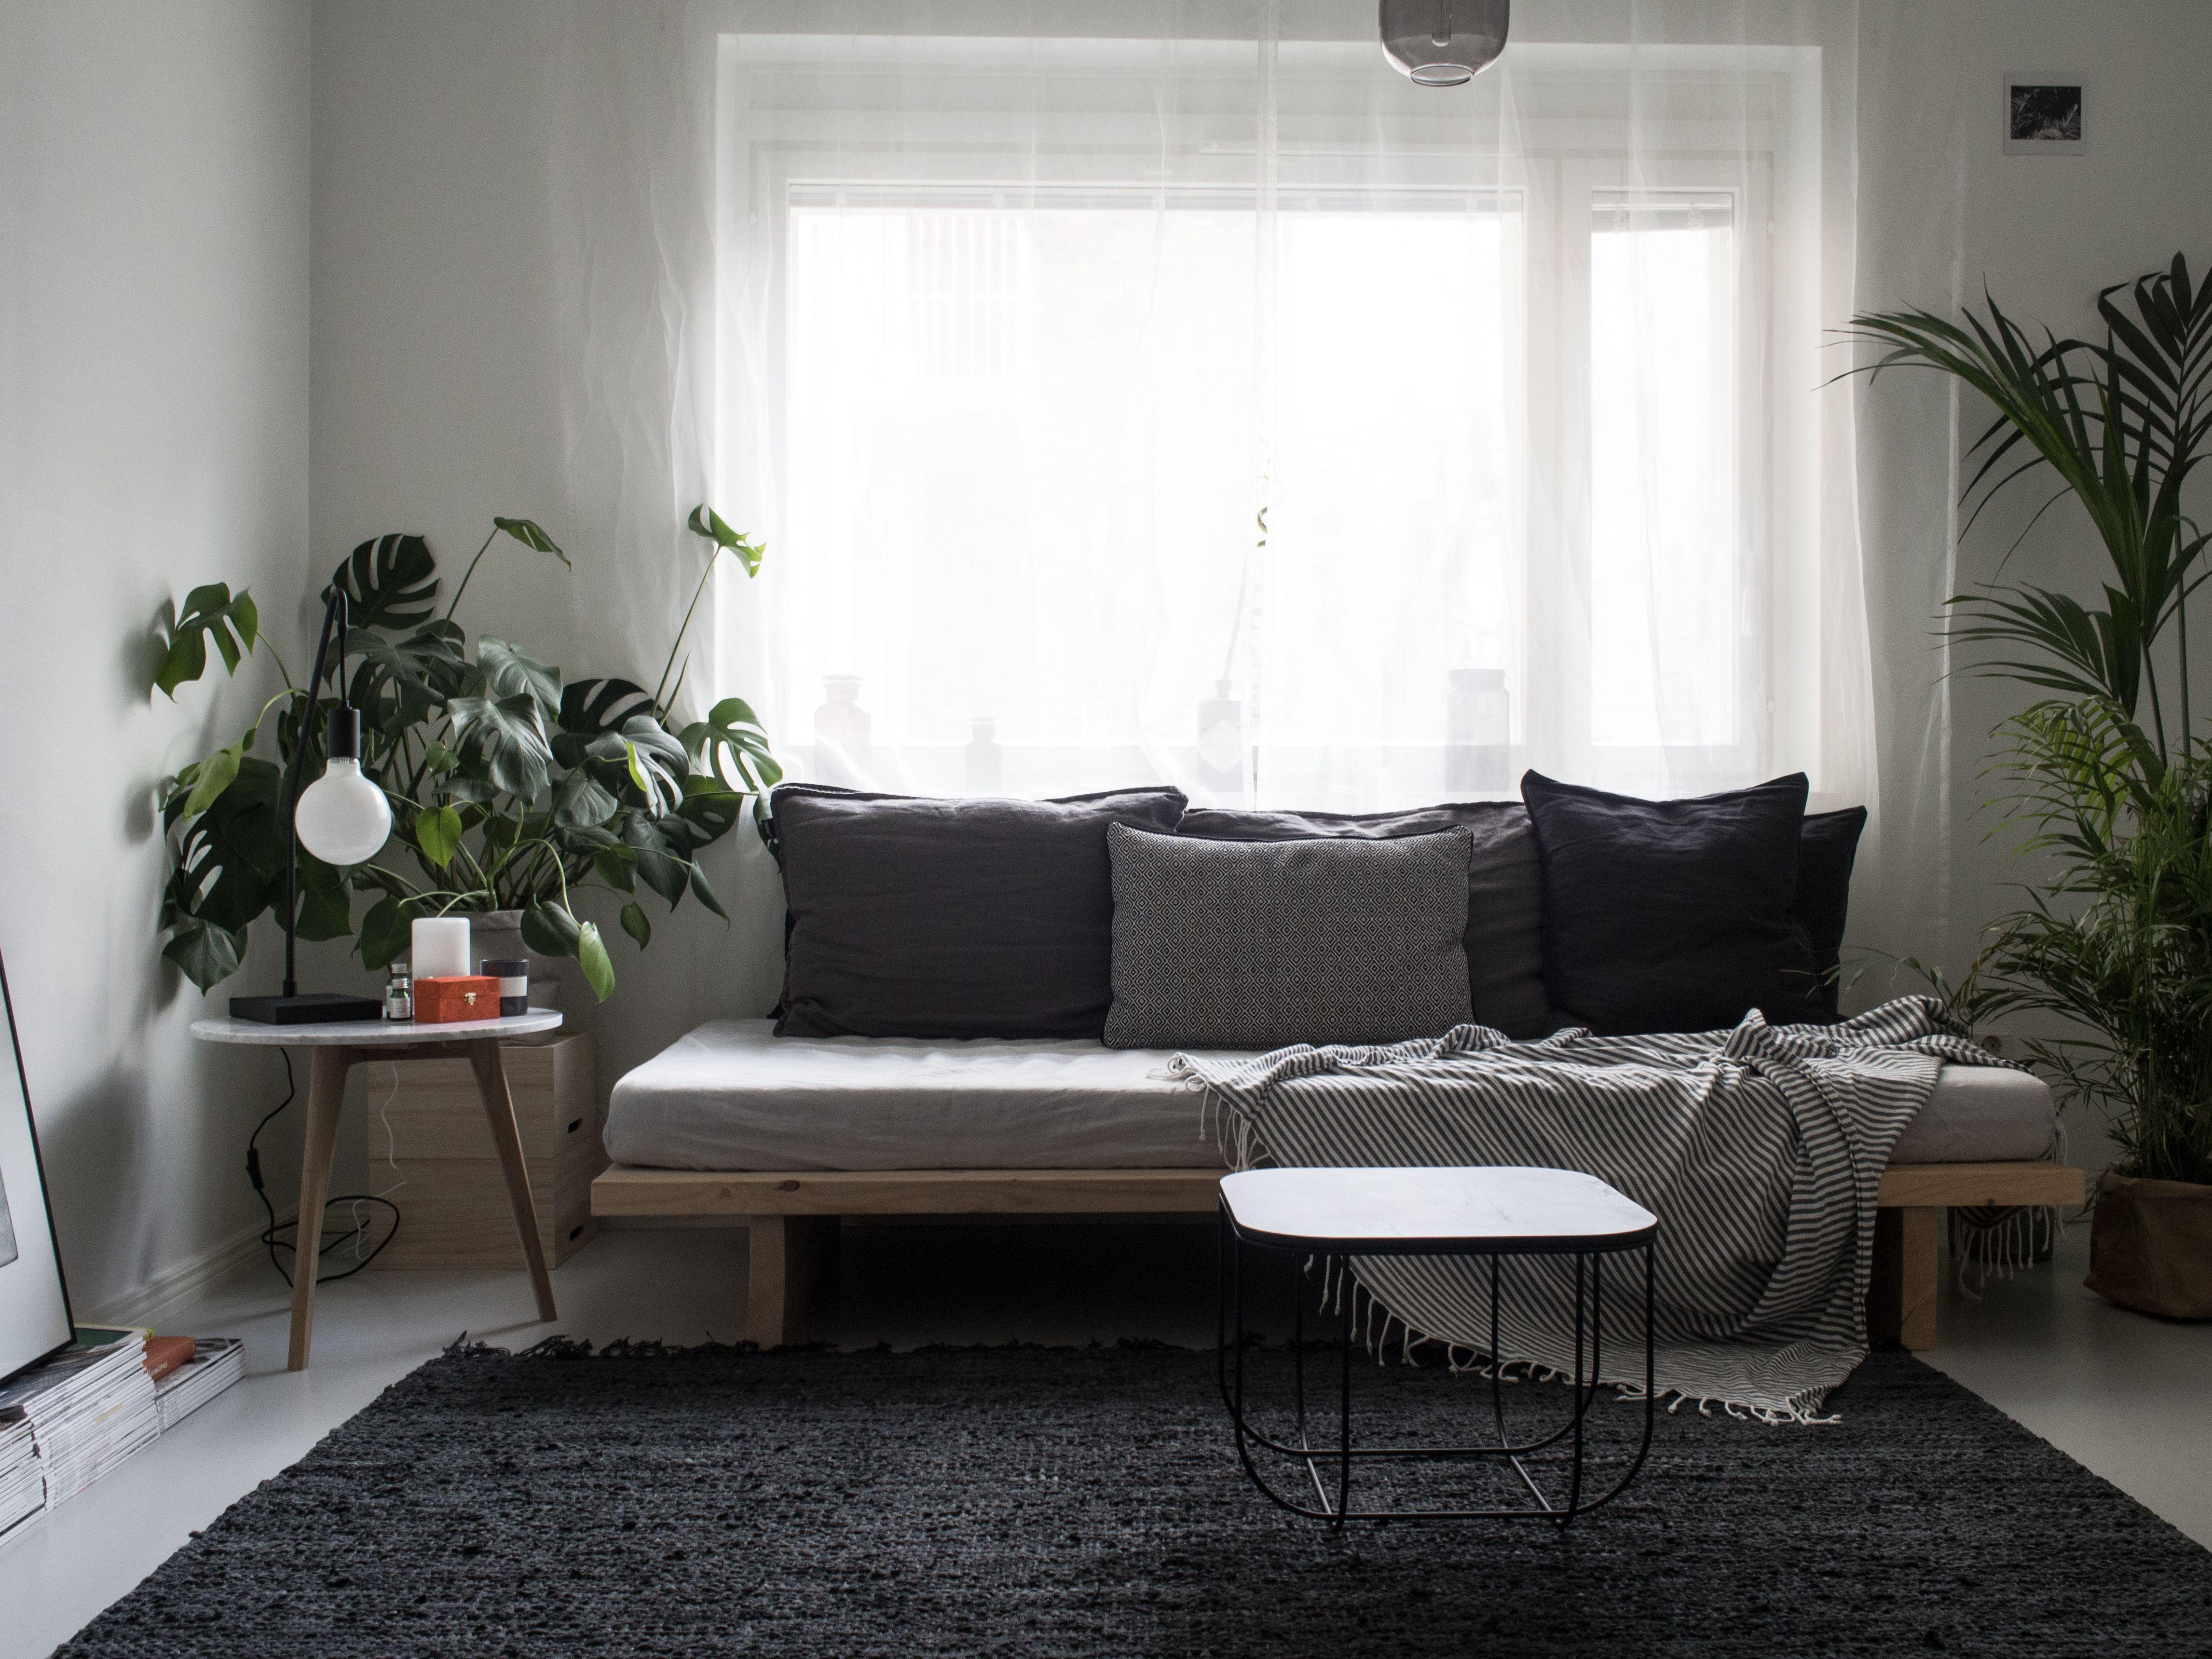 Diy Daybed In My Living Room Menu Fuwl Cage Table Broste Copenhagen Nor Rug